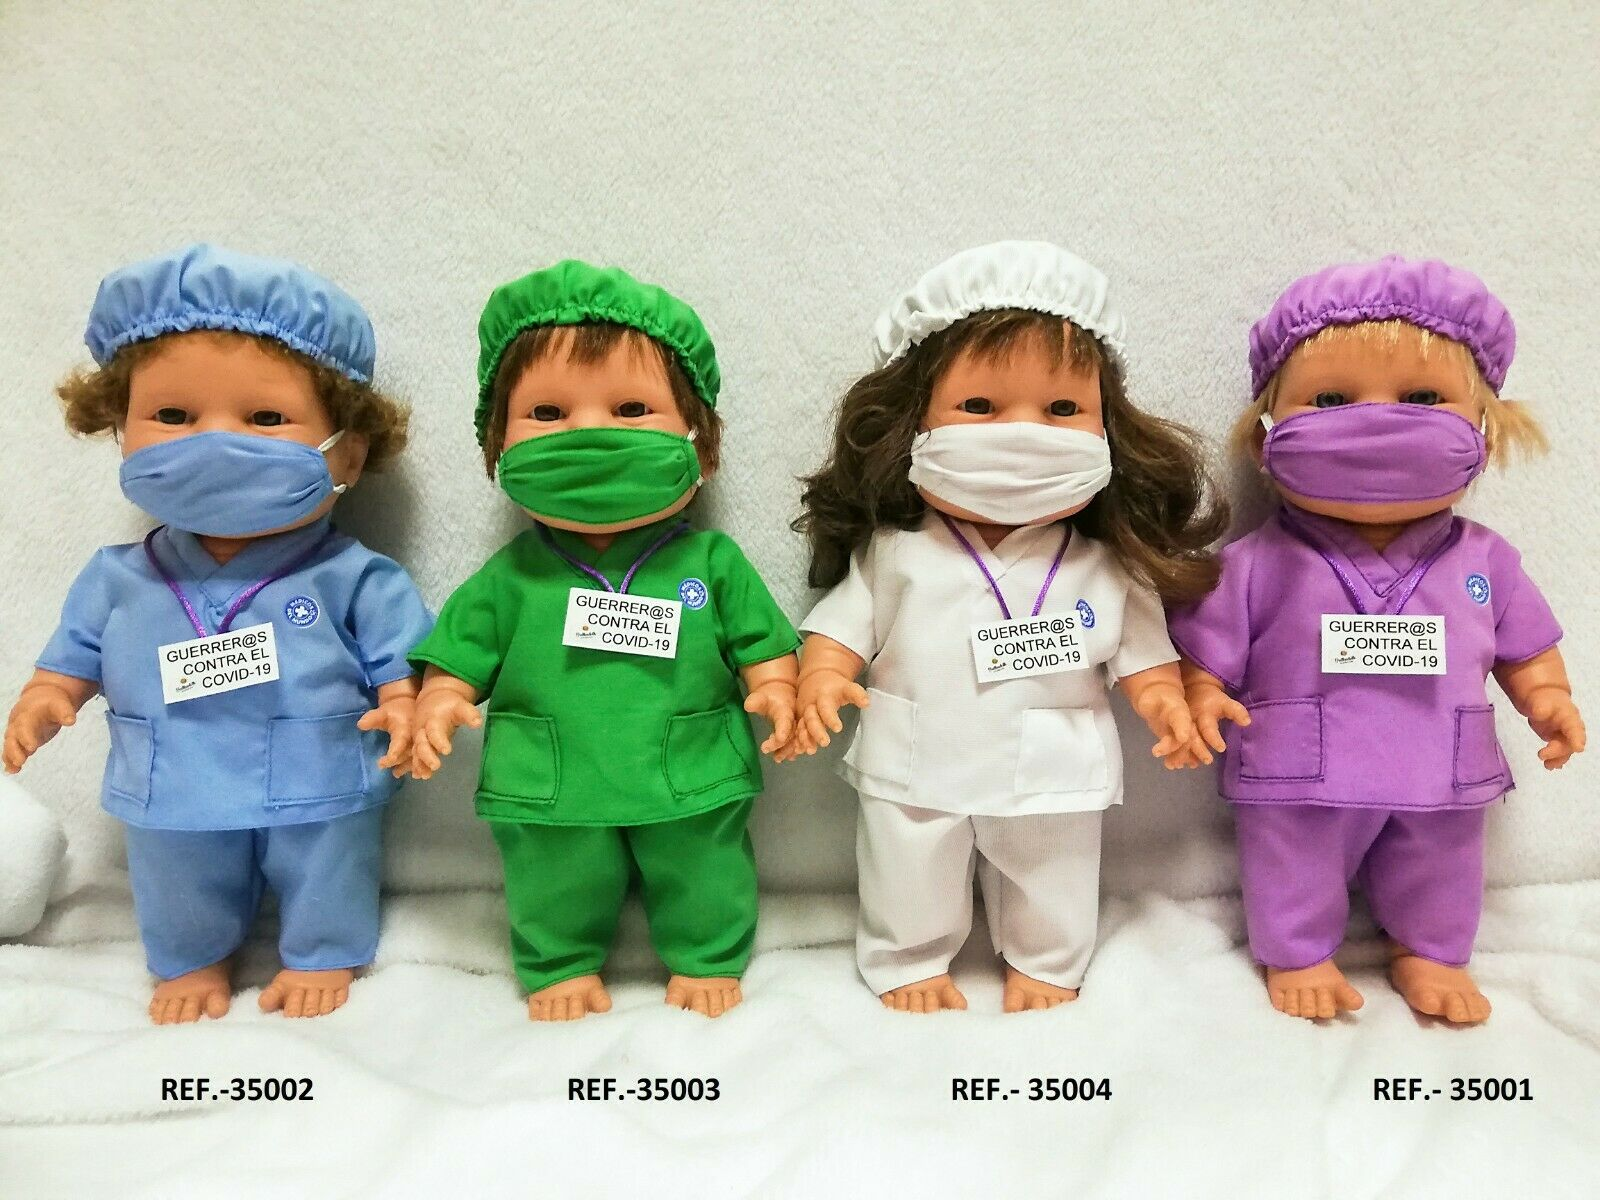 Serie de muñecas a beneficio de Médicos del Mundo